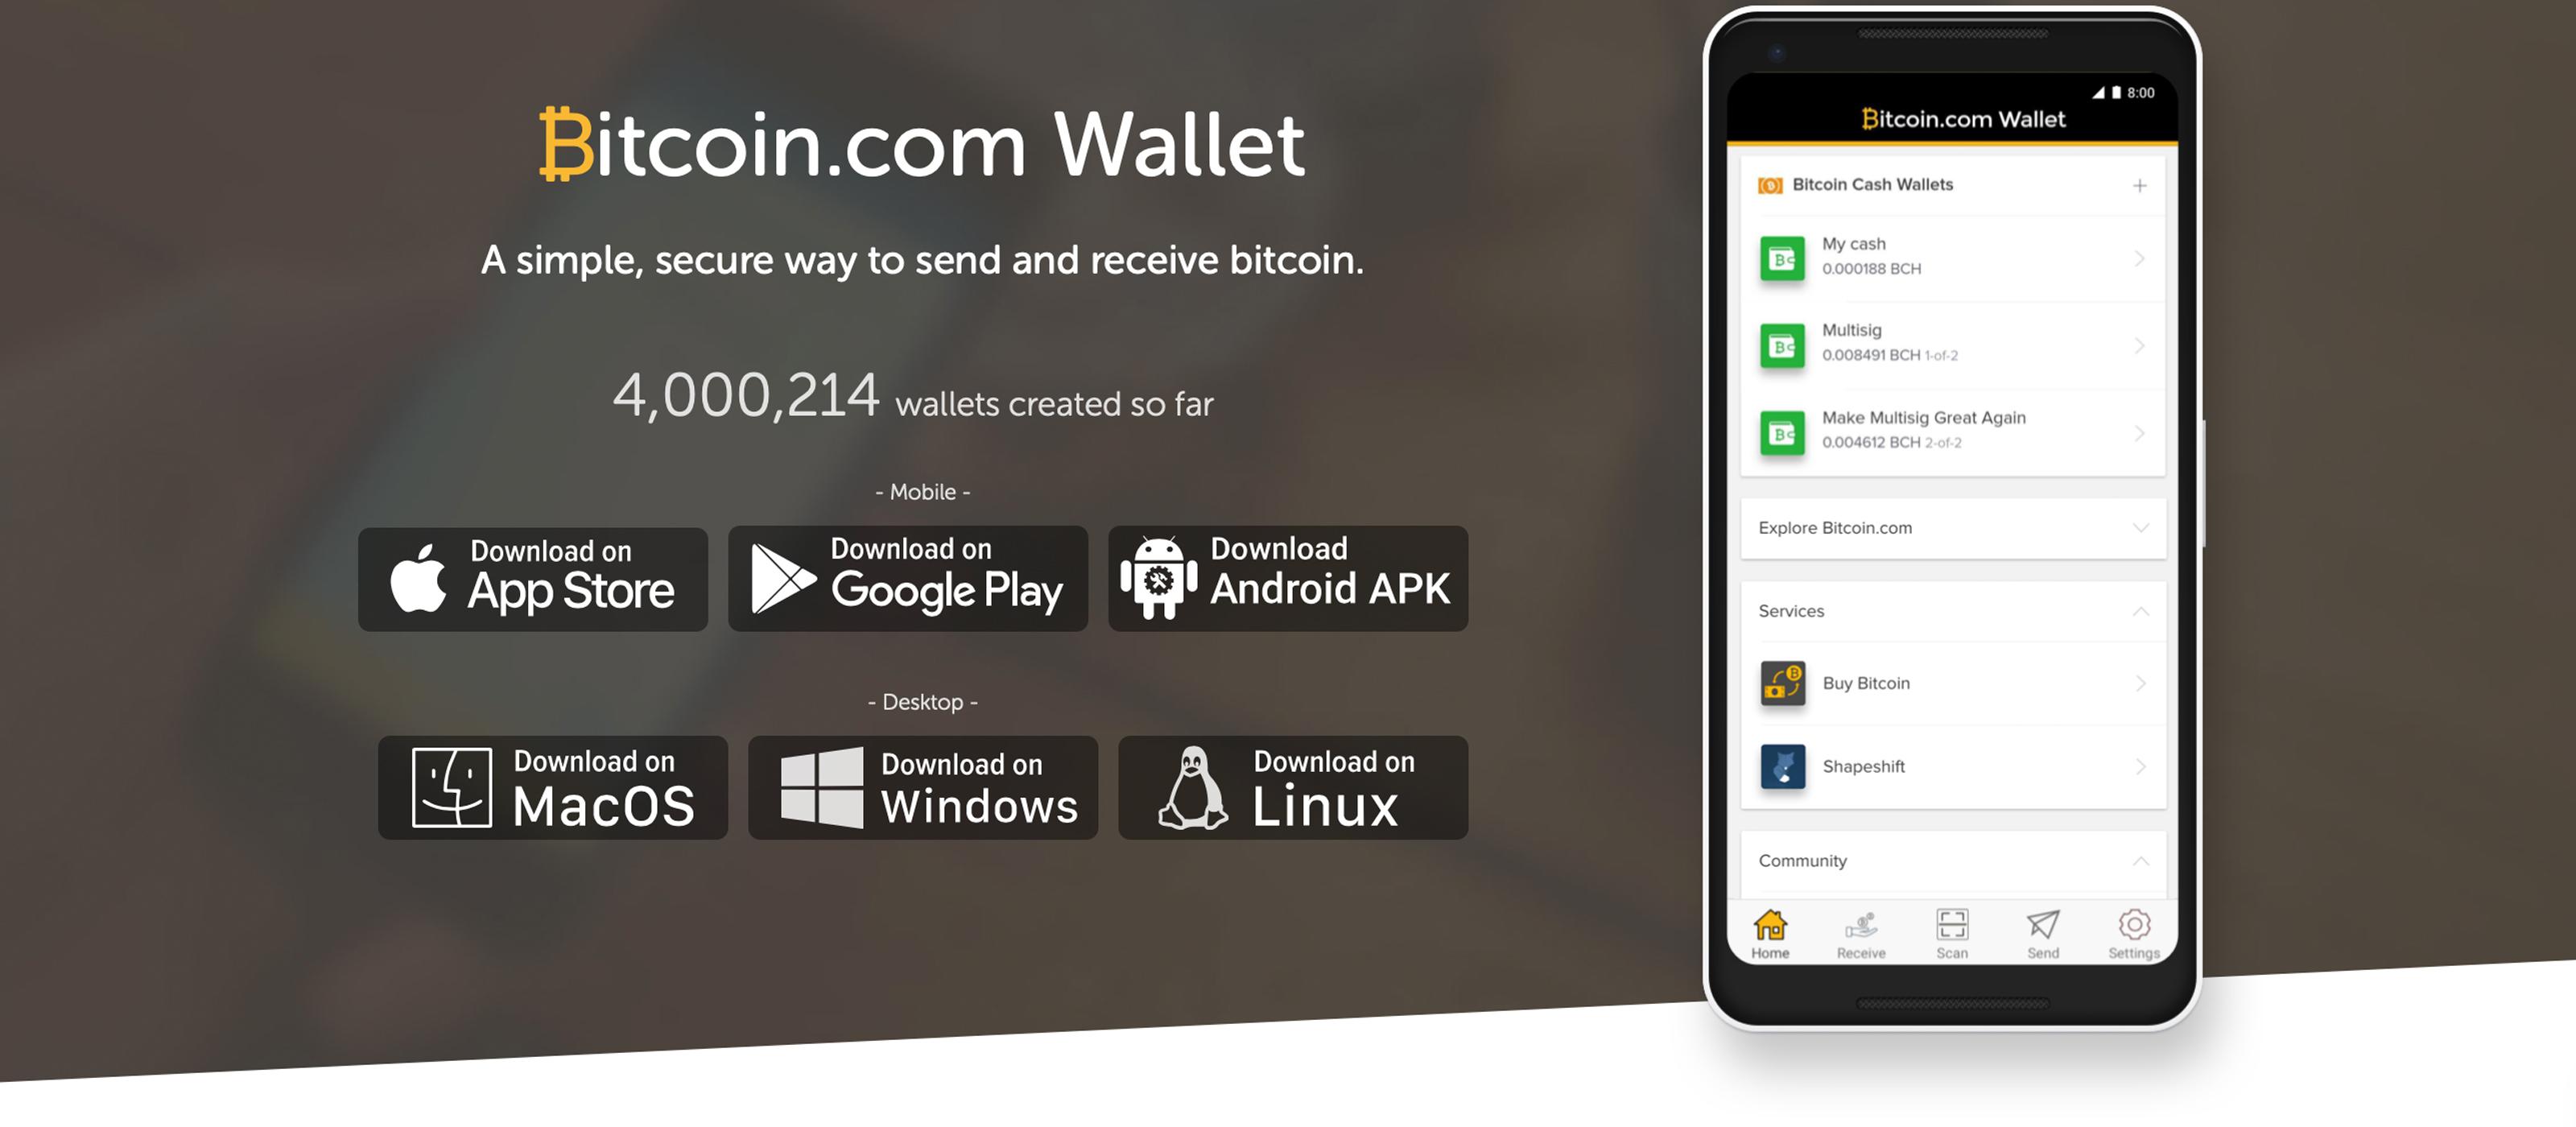 Bitscoins.net Celebrates 4 Million Wallets Created